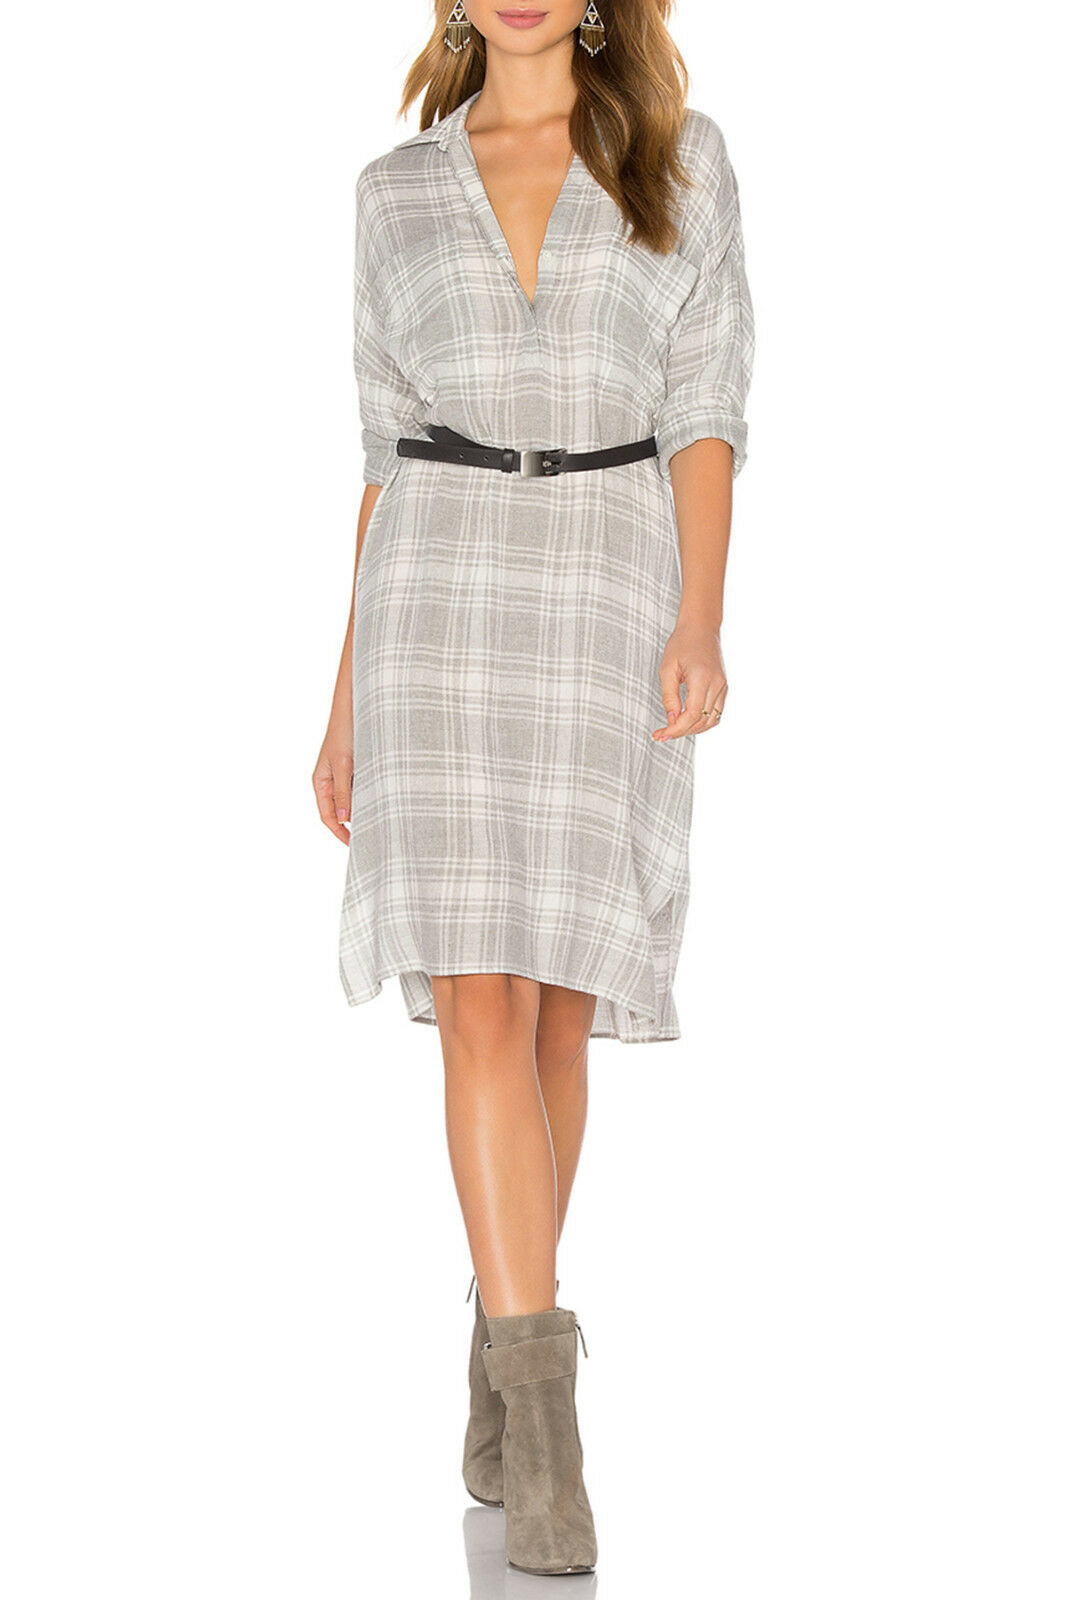 NWT James Perse Oversized Plaid Shirt Dress Wool Blend GREY PLAID Size 3 Large L